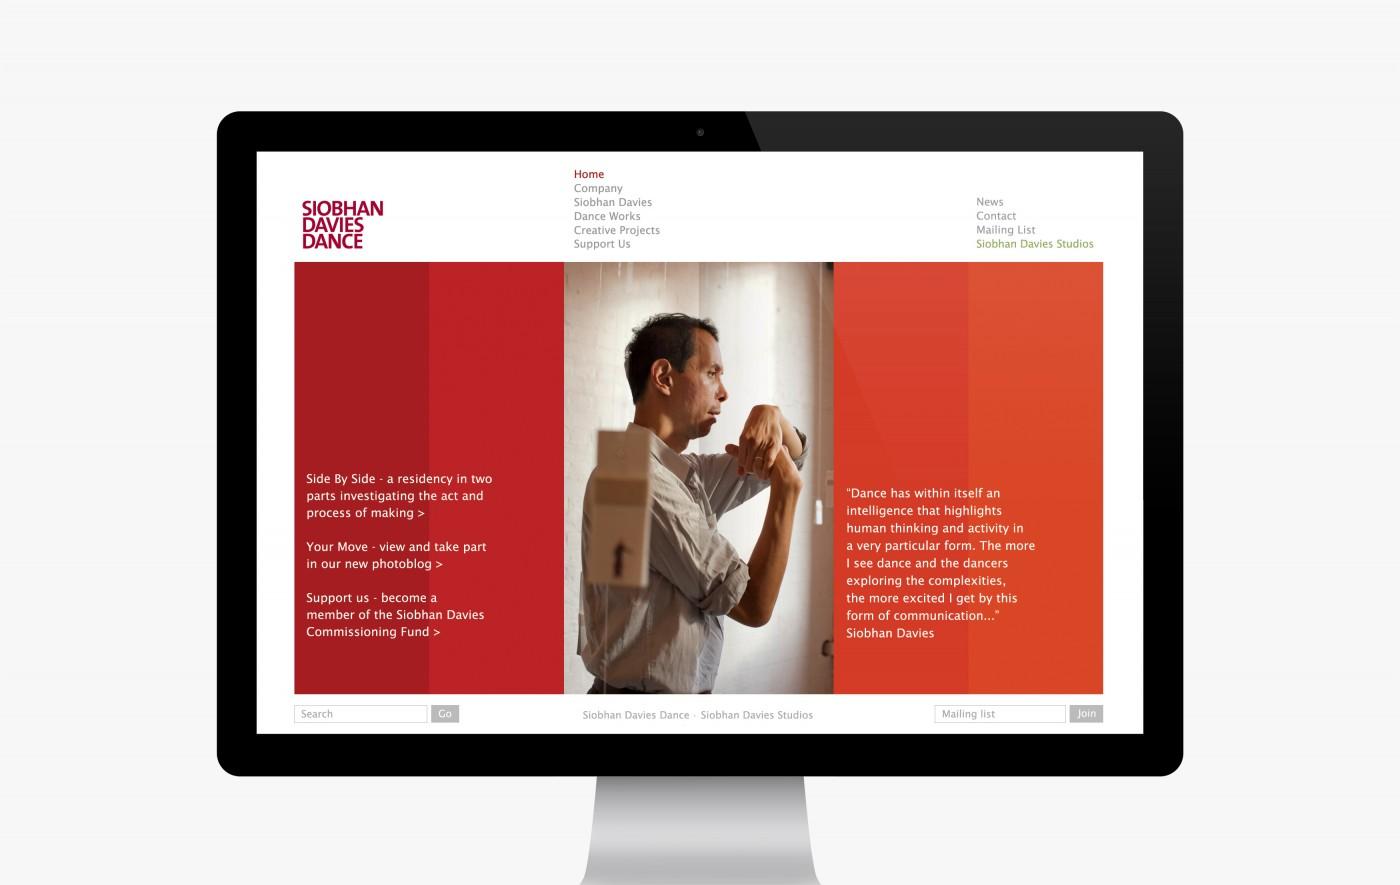 Siobhan Davies Dance company website (2007-2013)